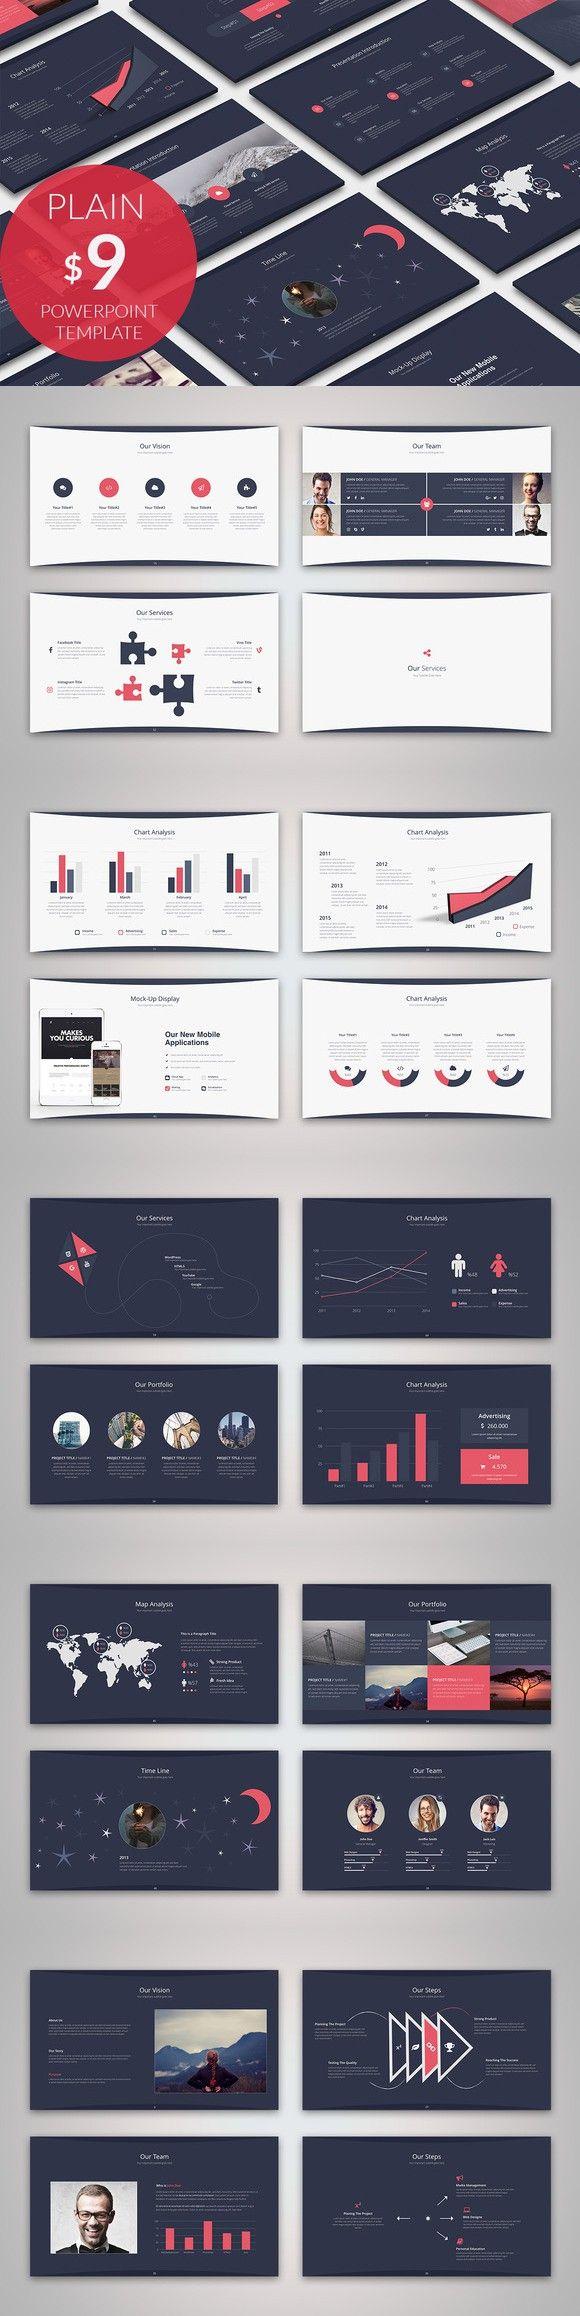 Plain Business Powerpoint Template. PowerPoint Templates. $9.00